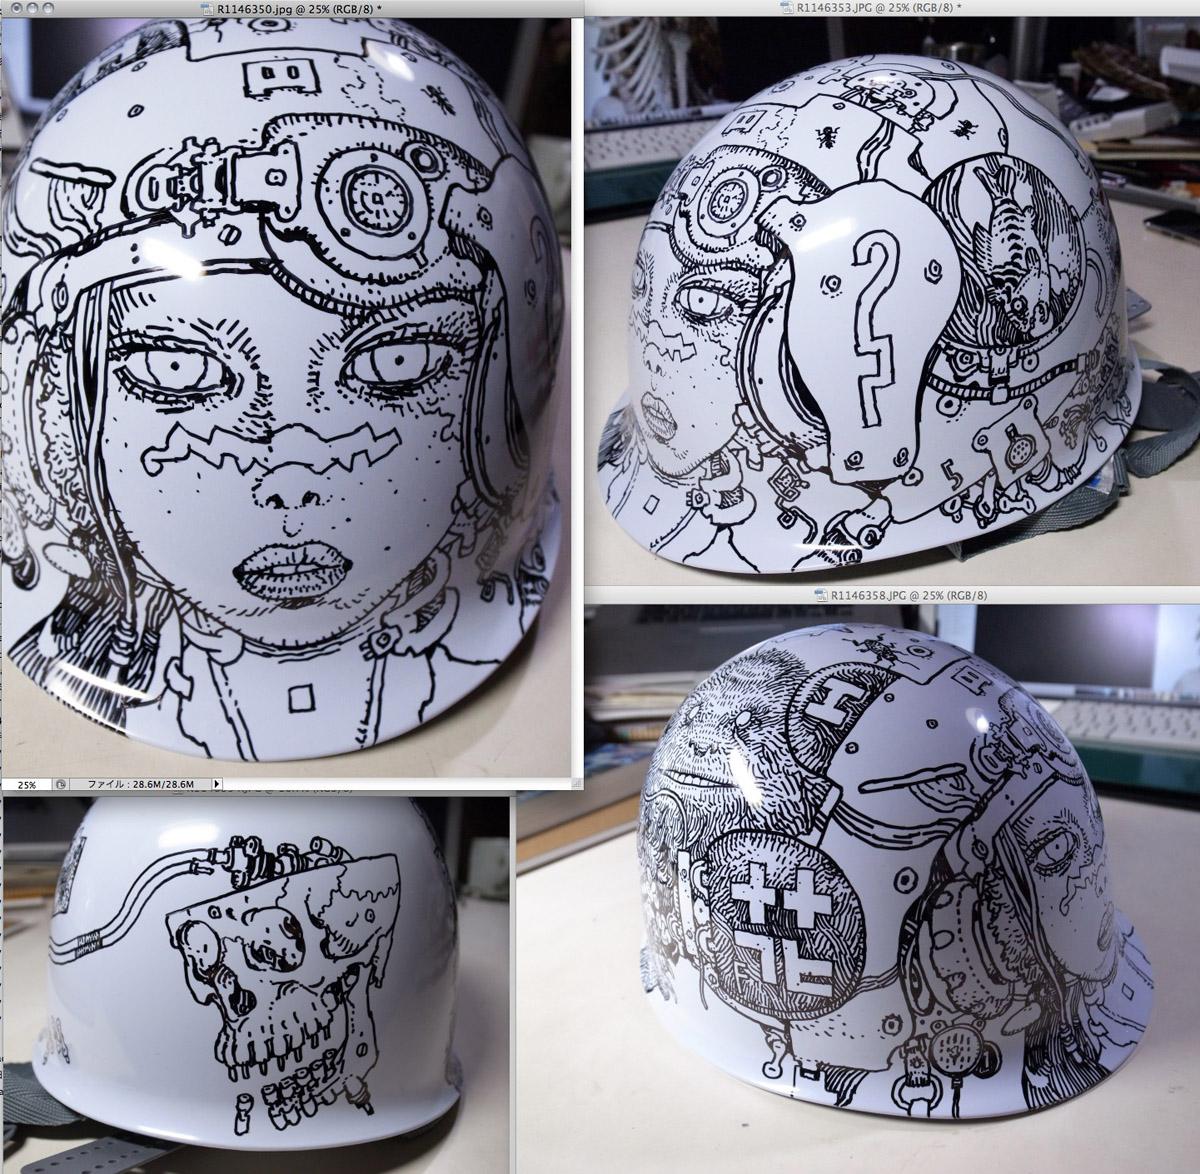 http://2.bp.blogspot.com/-AjDHv-HfOYY/T0PAS16JmjI/AAAAAAAALh8/oC71wjFCUR0/s1600/terra-helmet.jpg